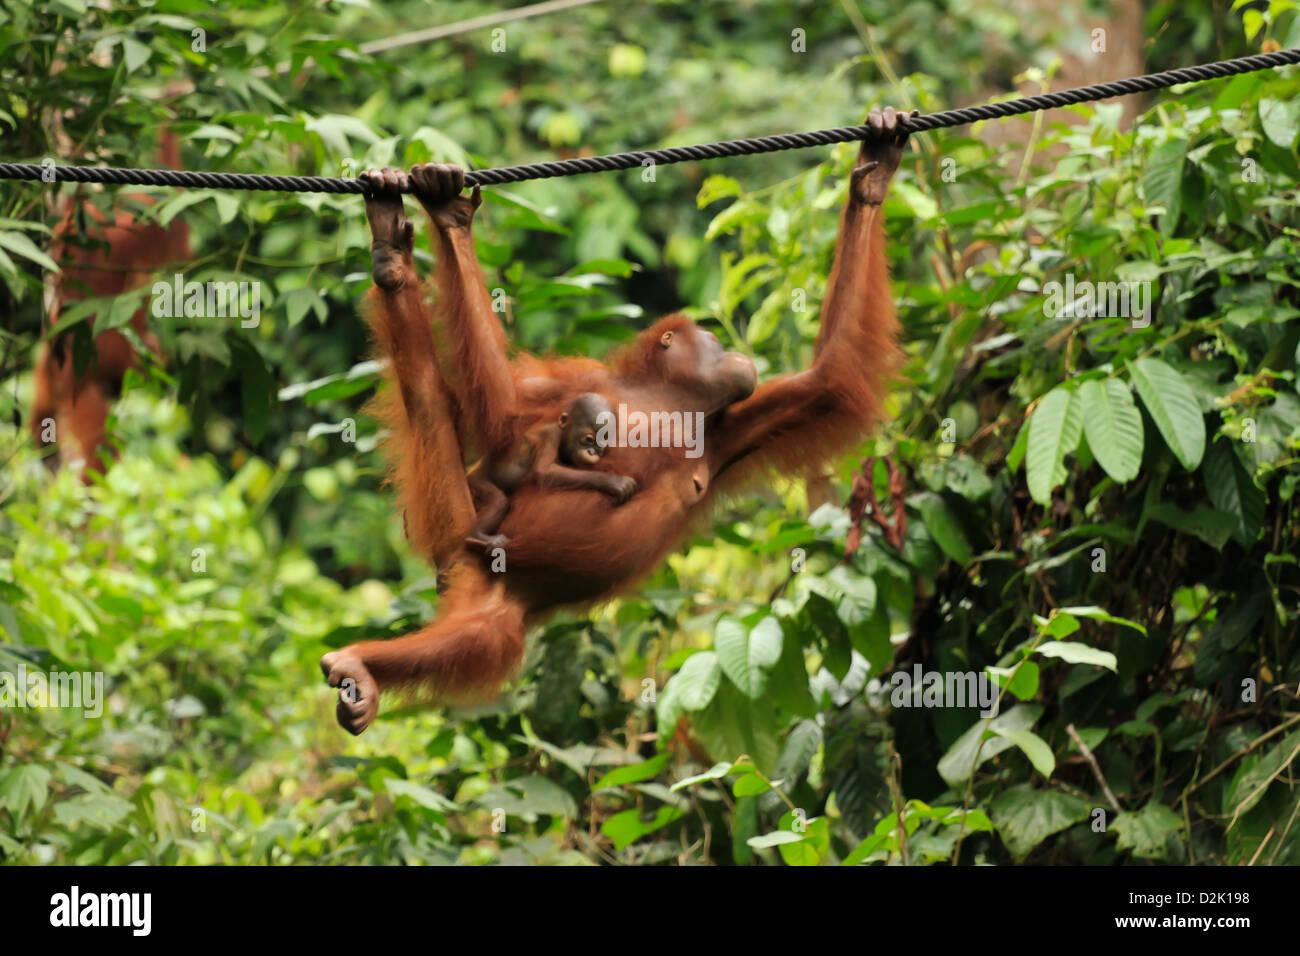 Orangutan female with kid - Stock Image